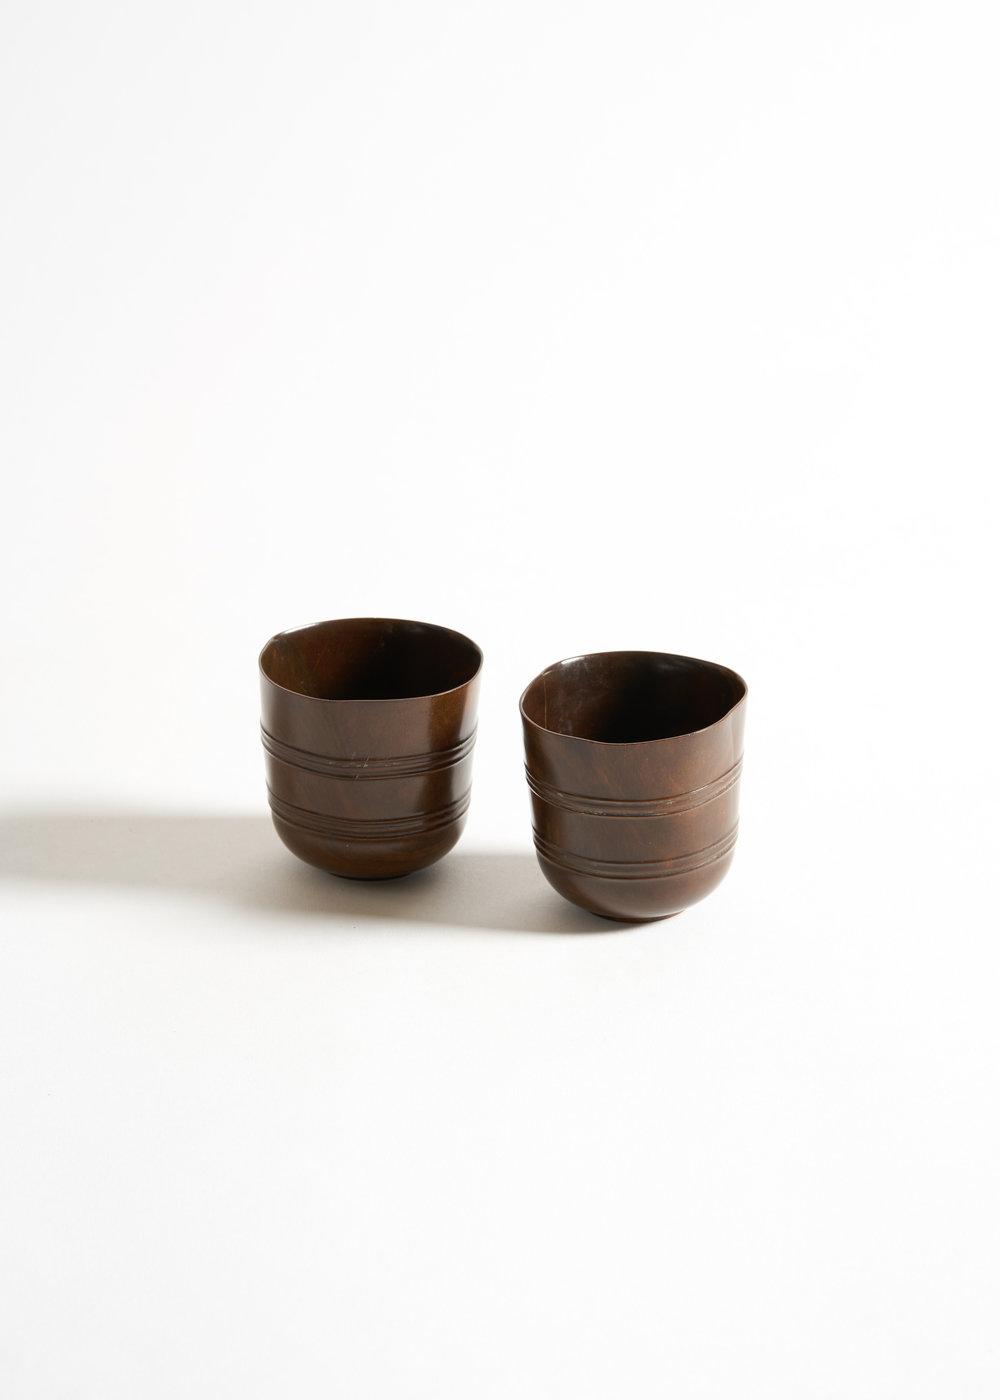 A Fine and Rare Pair of Lignum Vitae Dipper Cups